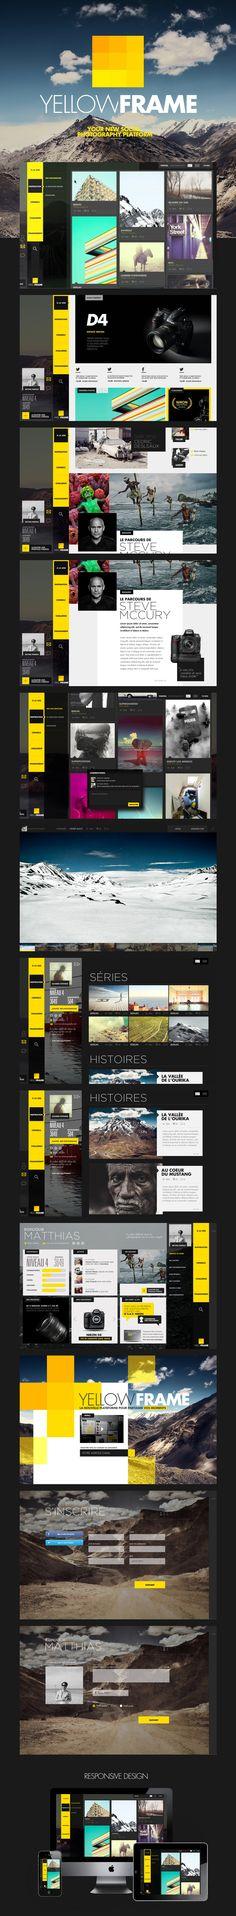 YELLOW FRAME / Thomas Ciszewski | #webdesign #it #web #design #layout #userinterface #website #webdesign <<< repinned by an #advertising #agency from #Hamburg / #Germany - www.BlickeDeeler.de | Follow us on www.facebook.com/BlickeDeeler